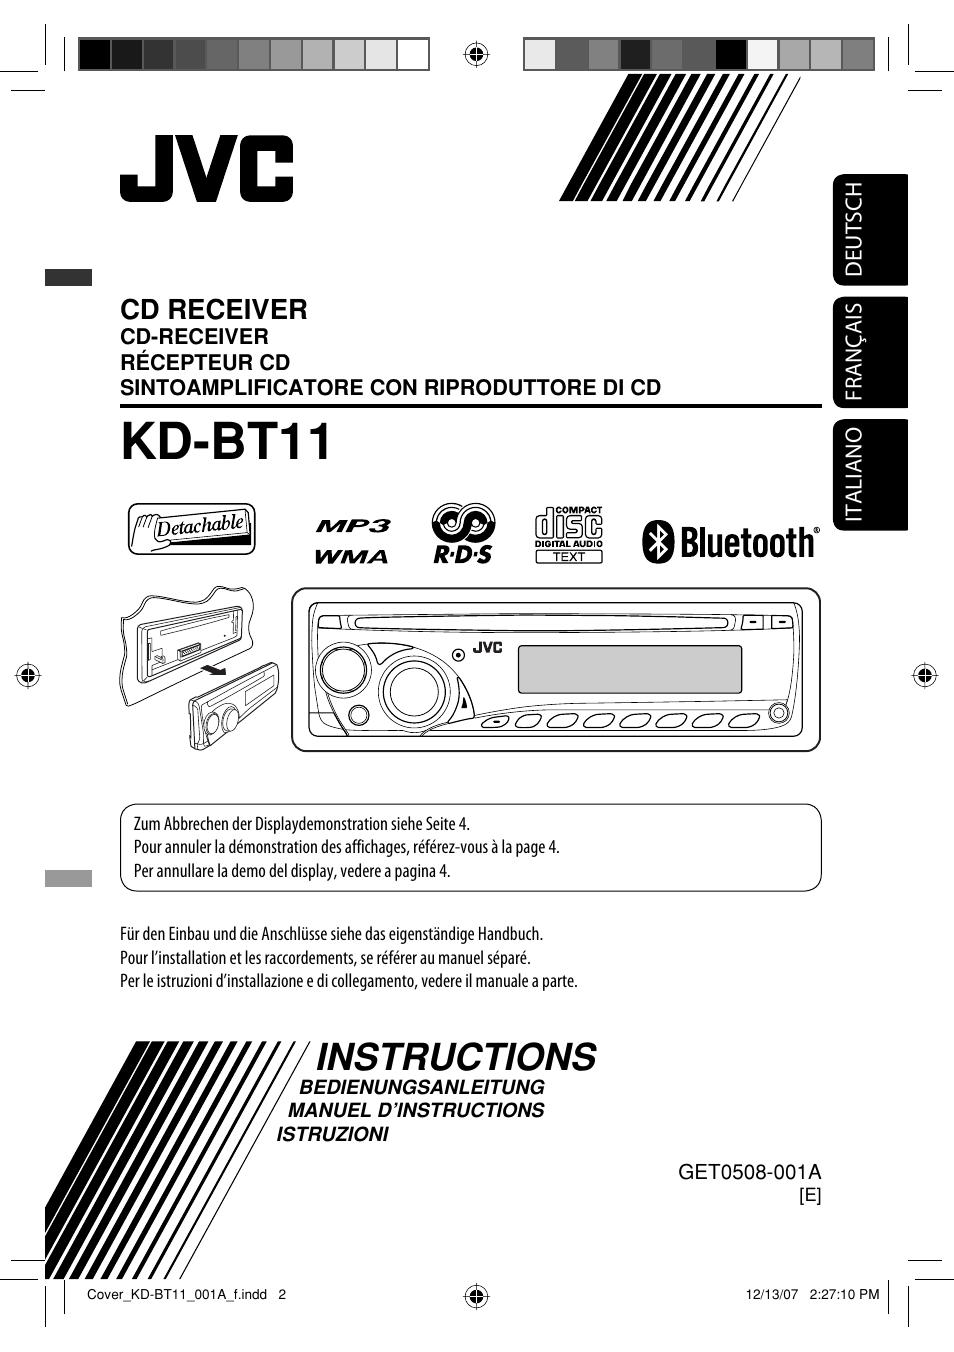 jvc kd bt11 user manual 107 pages original mode rh manualsdir com JVC GR Camcorder User Manual JVC Car Radio Manual